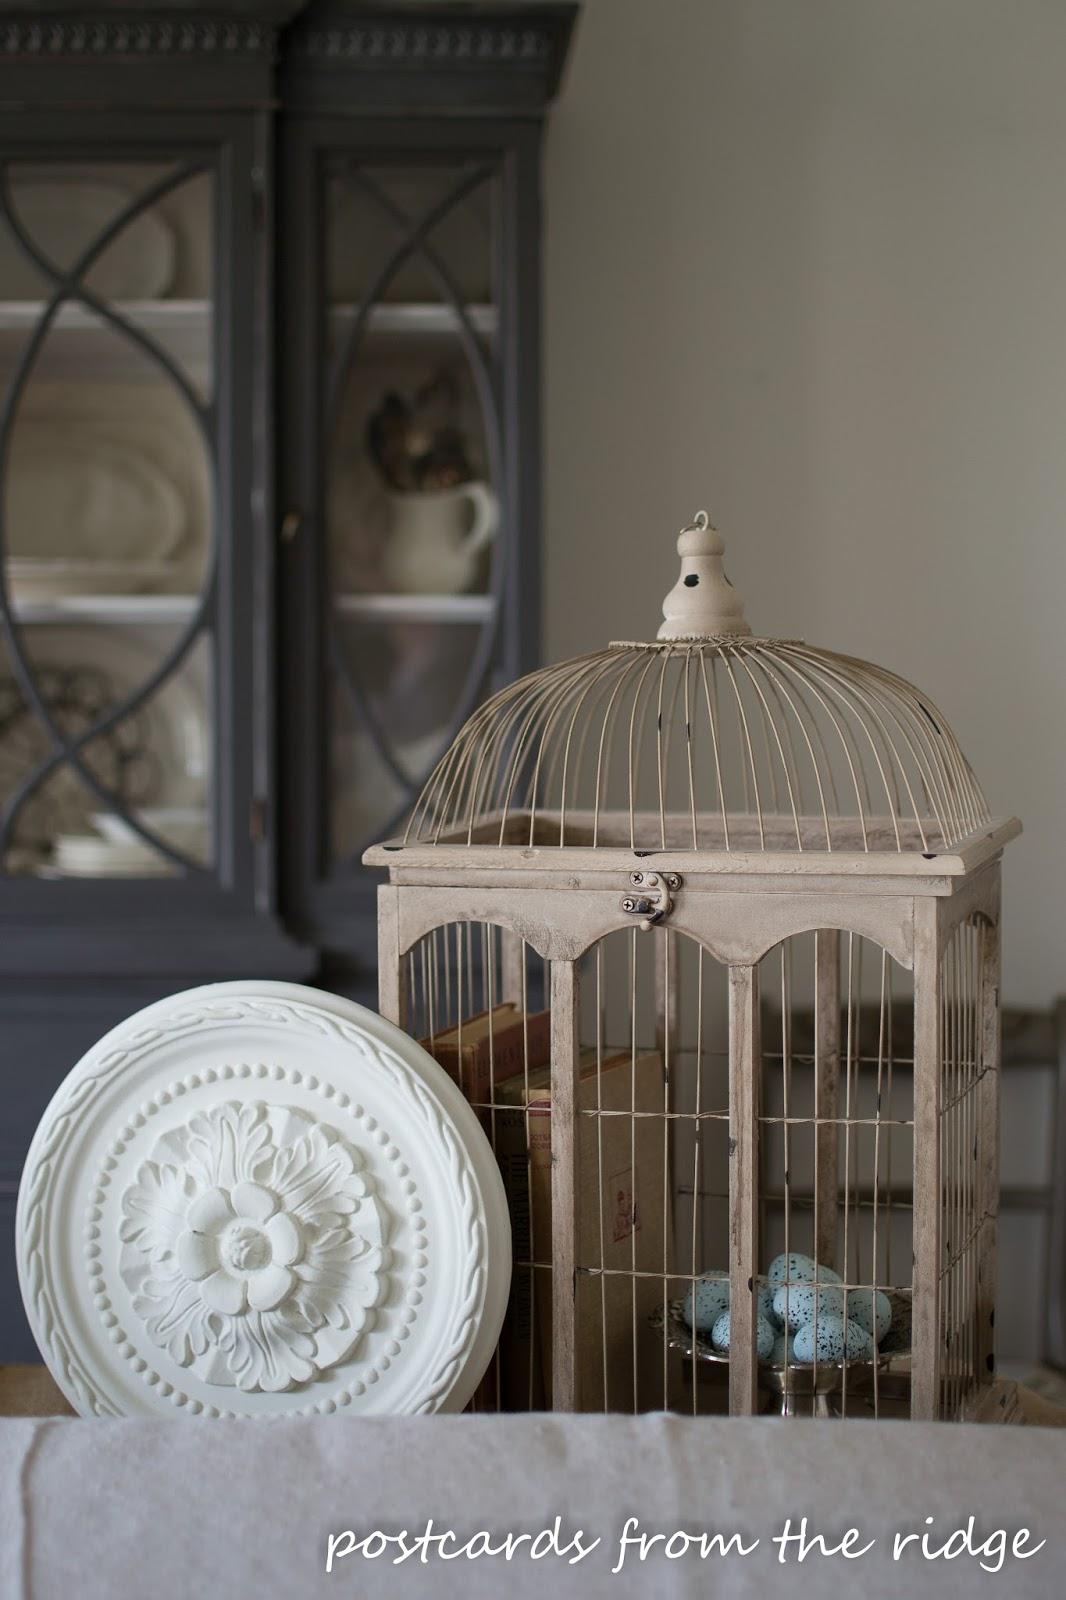 ceramic bird eggs in a bird cage